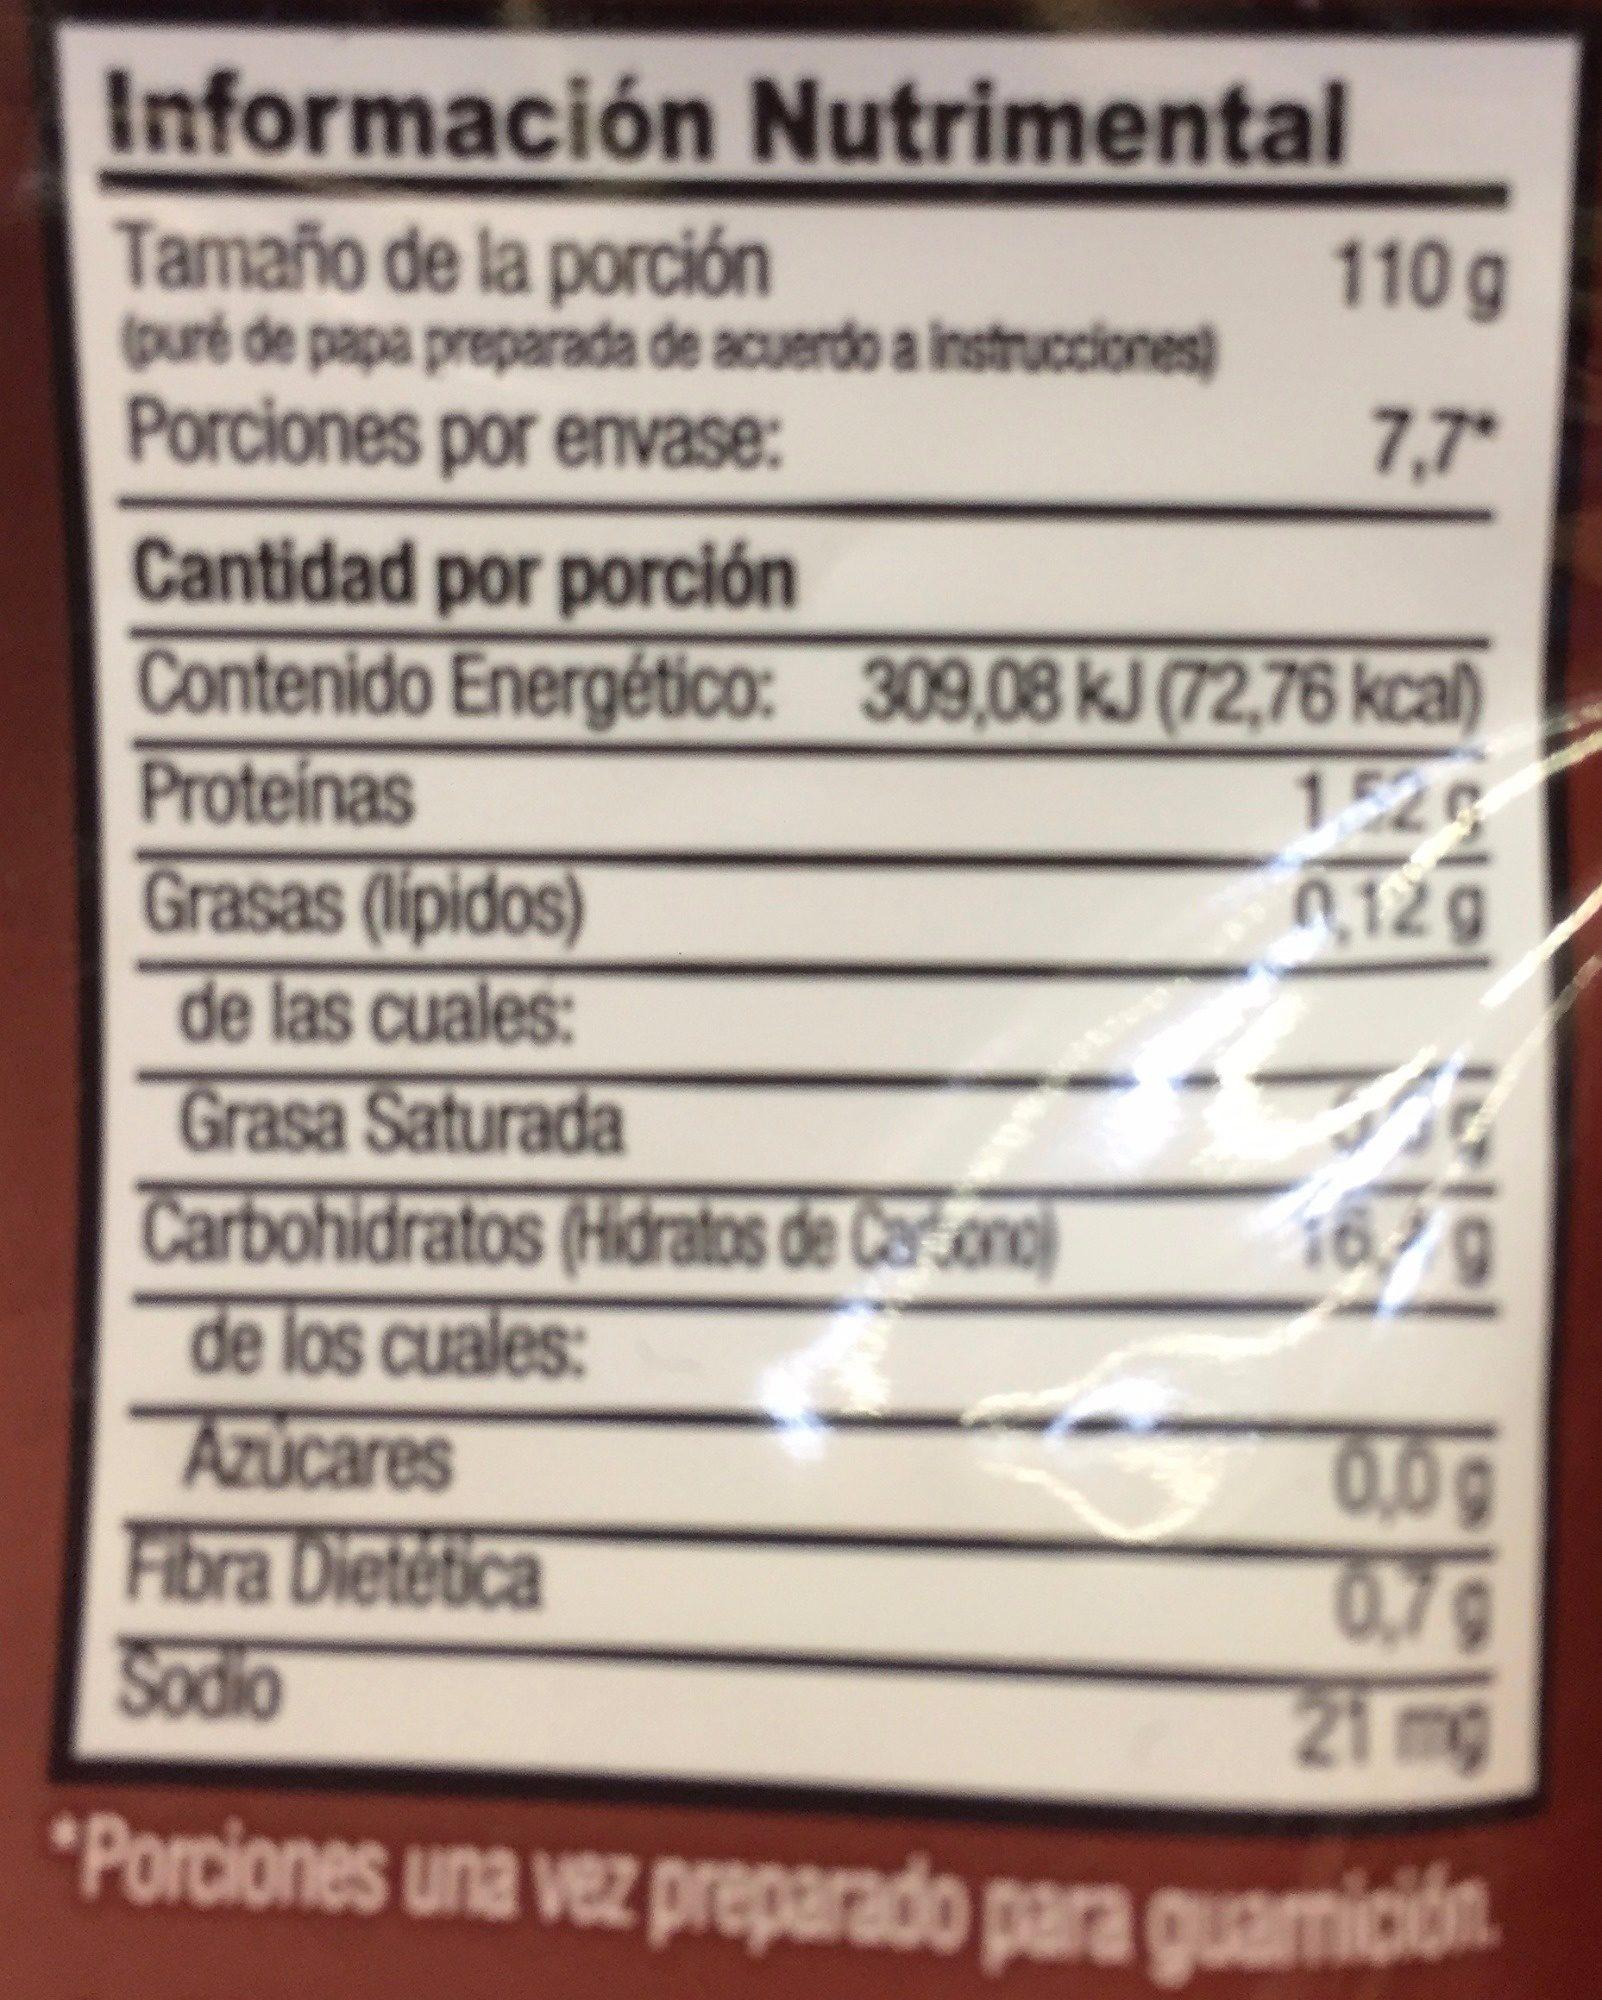 PURE DE PAPA INSTANTANEO - Voedingswaarden - es